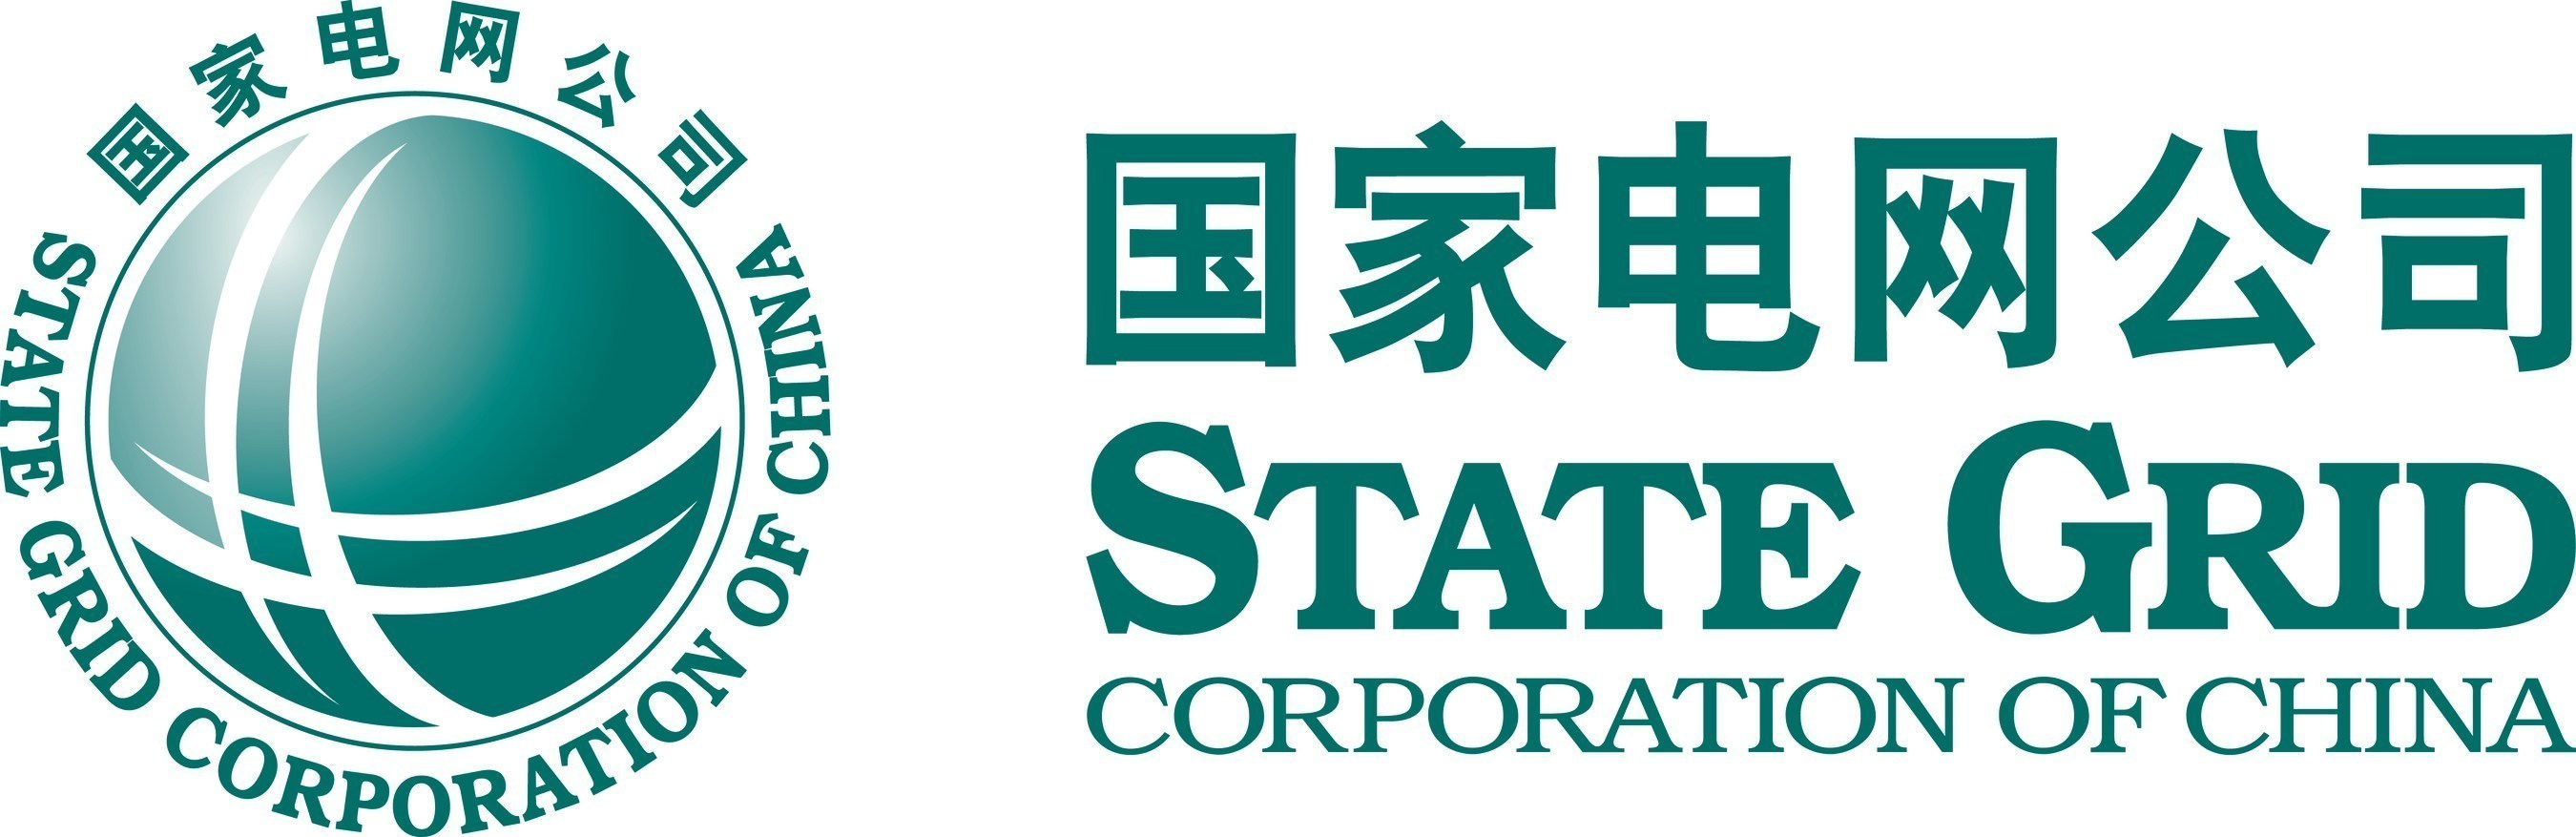 SGCC logo